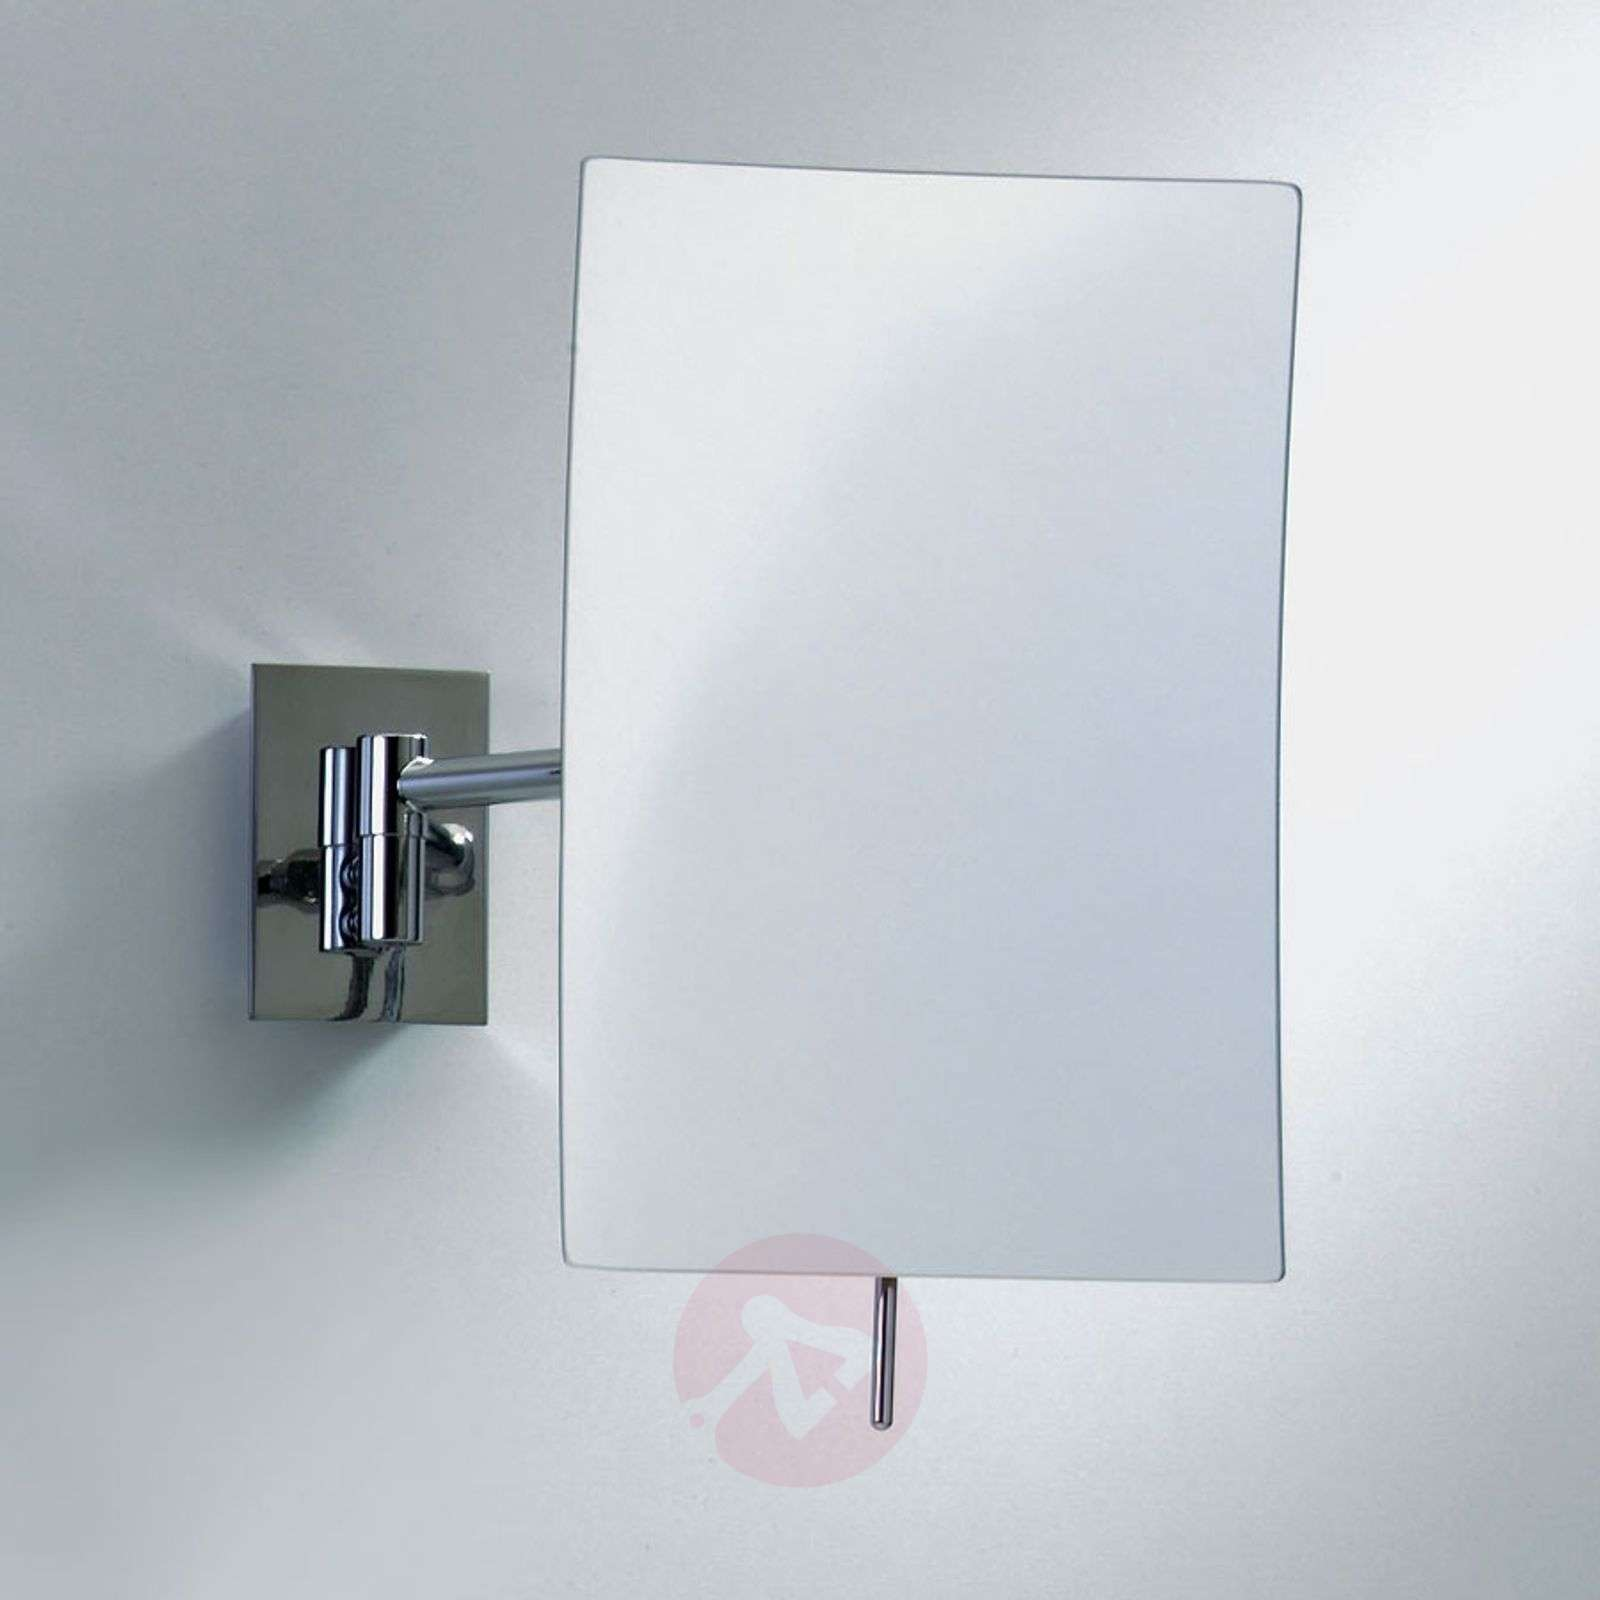 NOOK fine cosmetic wall mirror-2504210-01